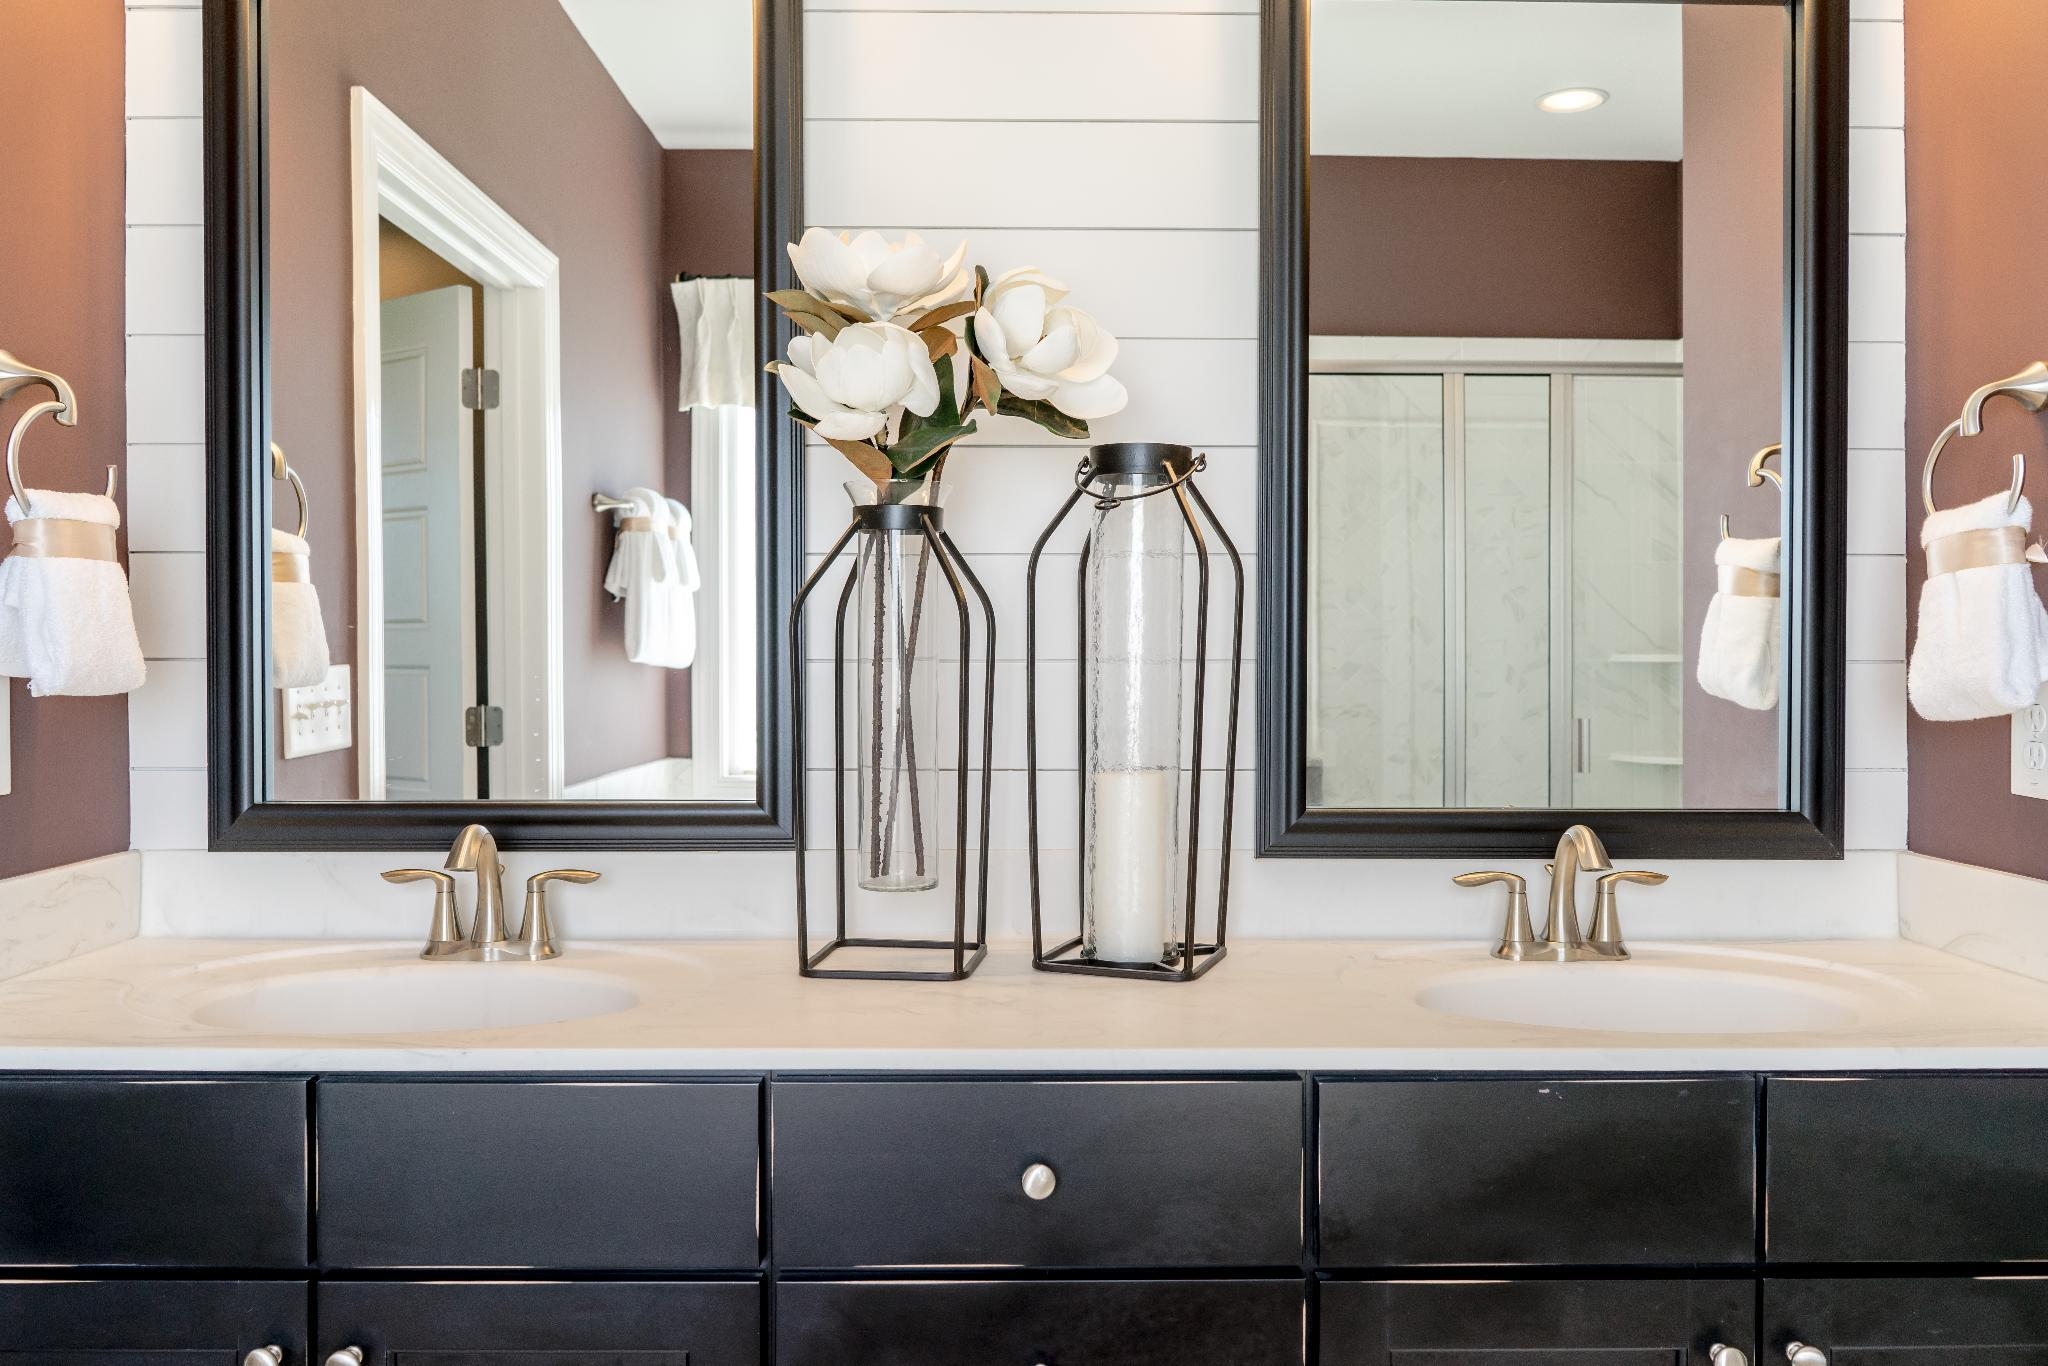 Bathroom-in-The Belhaven-at-Portofino-in-Clayton